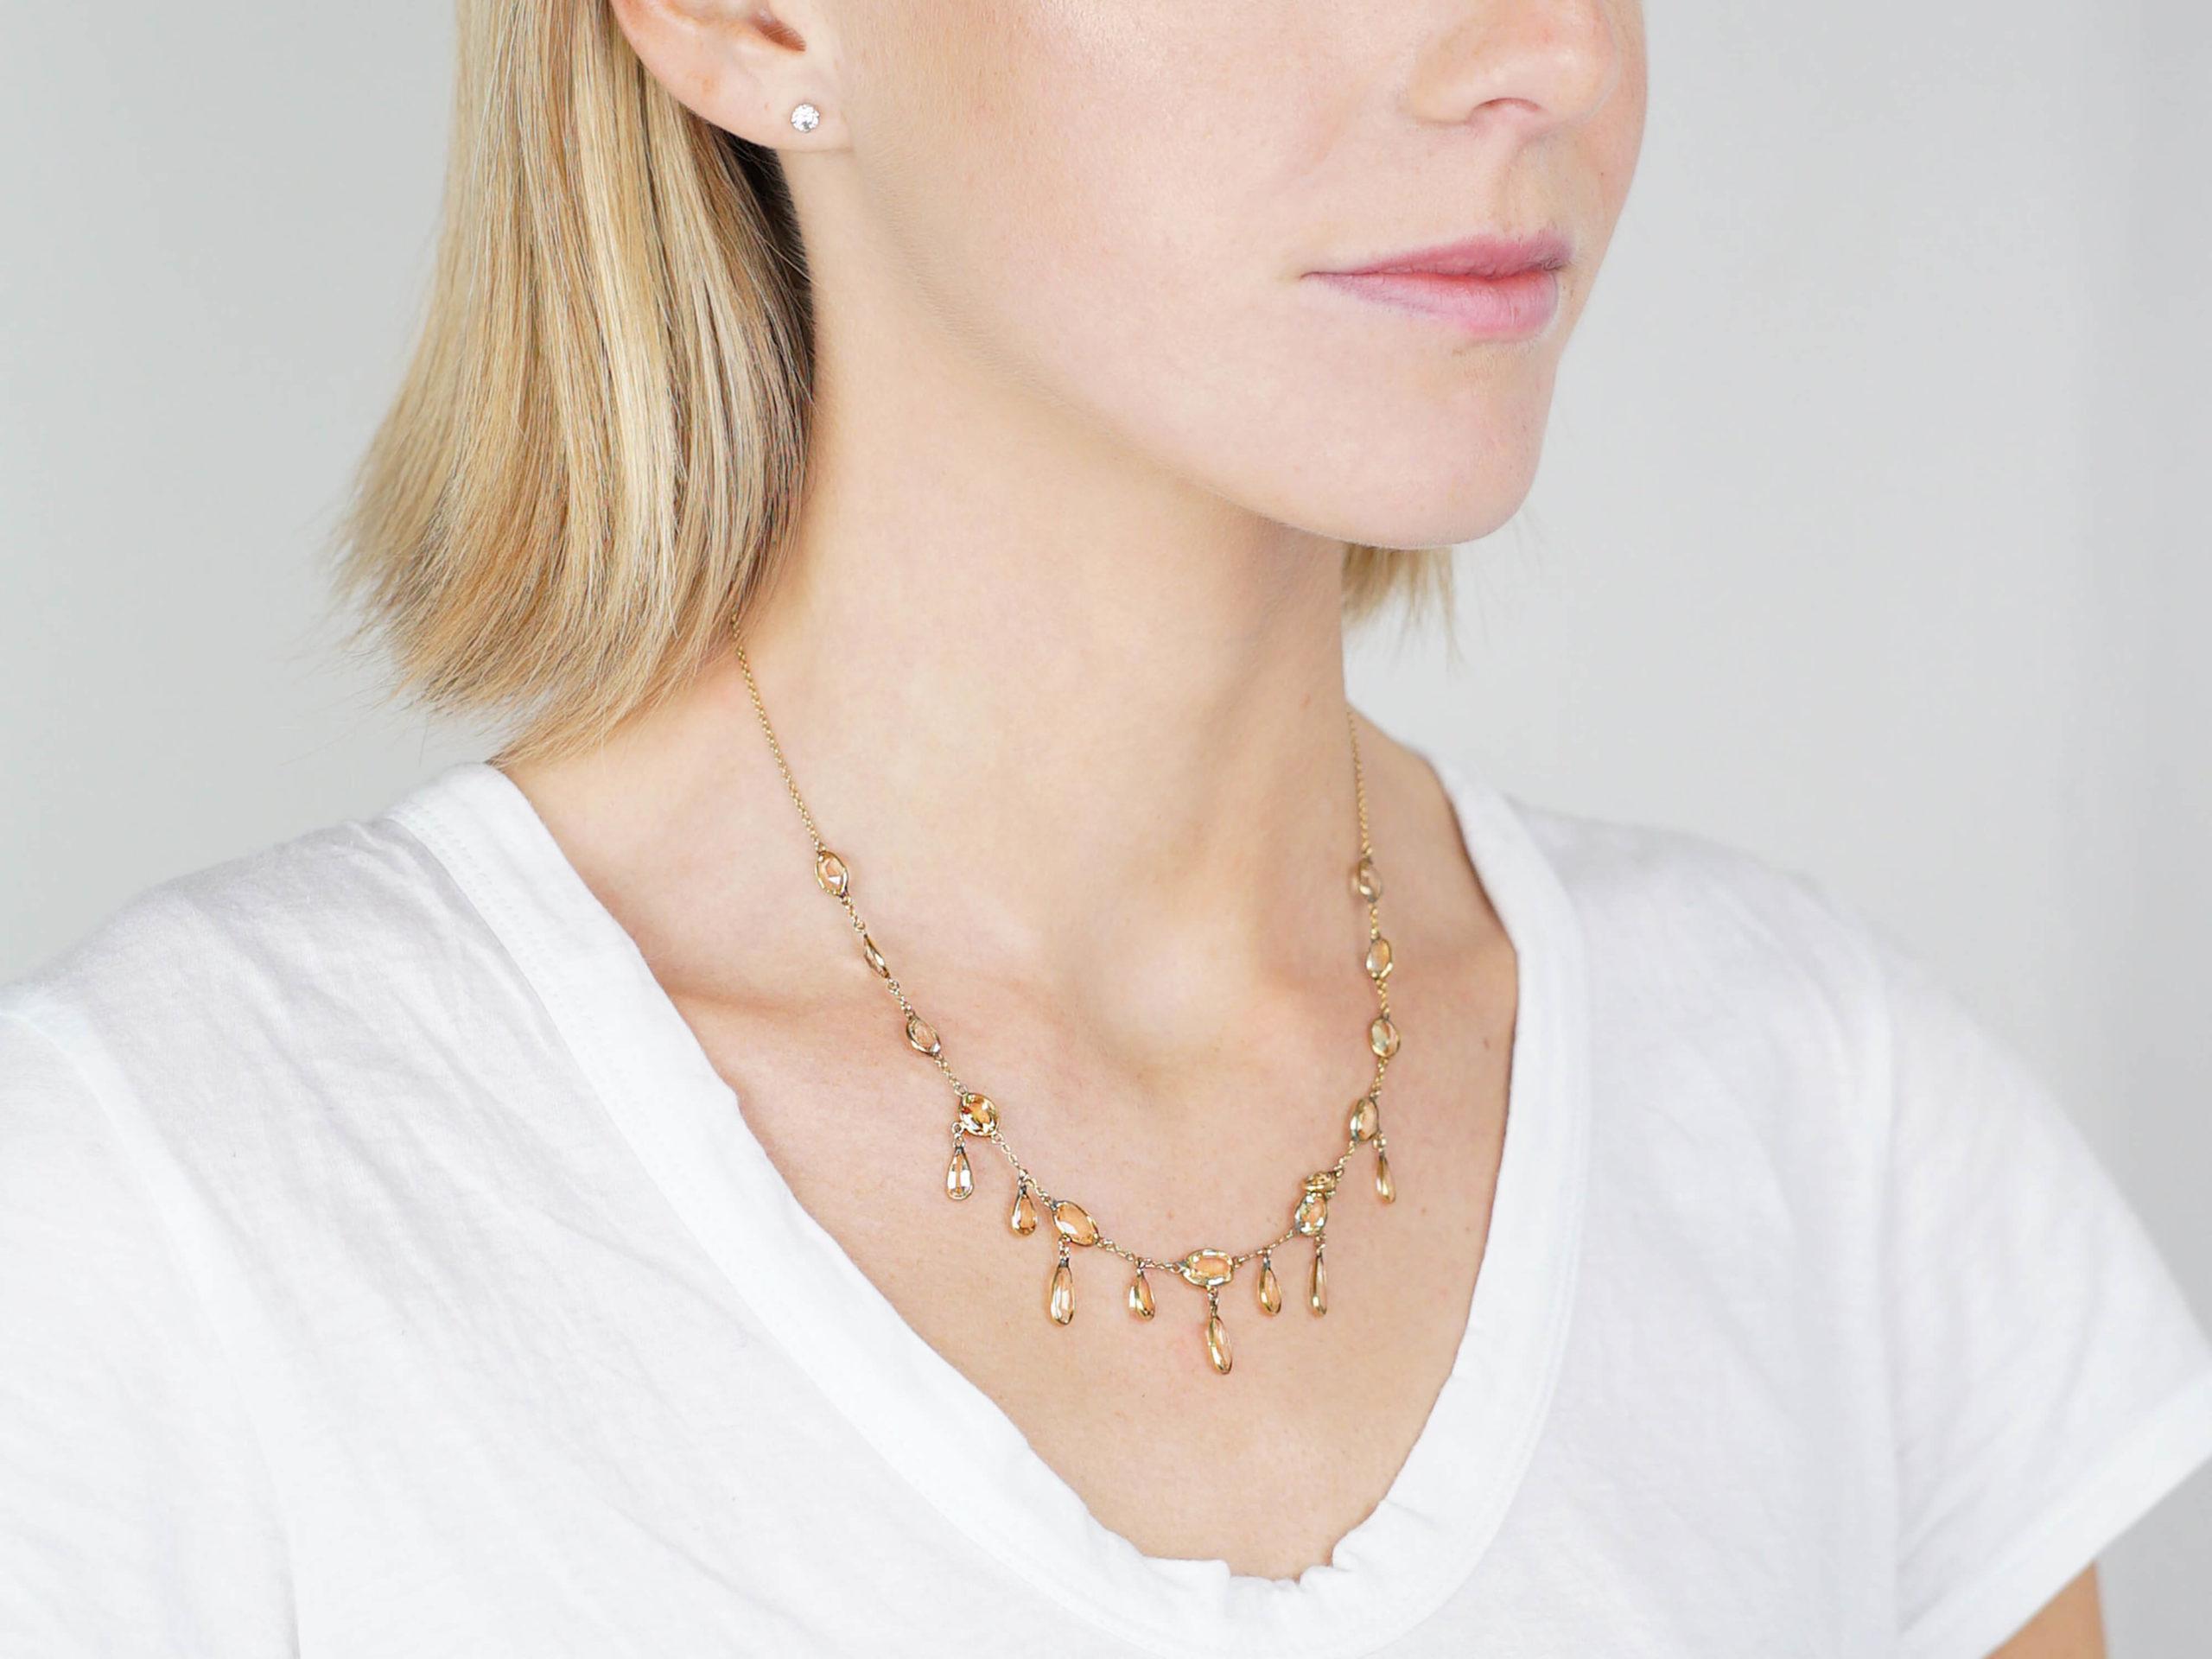 Edwardian 15ct Gold & Topaz Drops Necklace